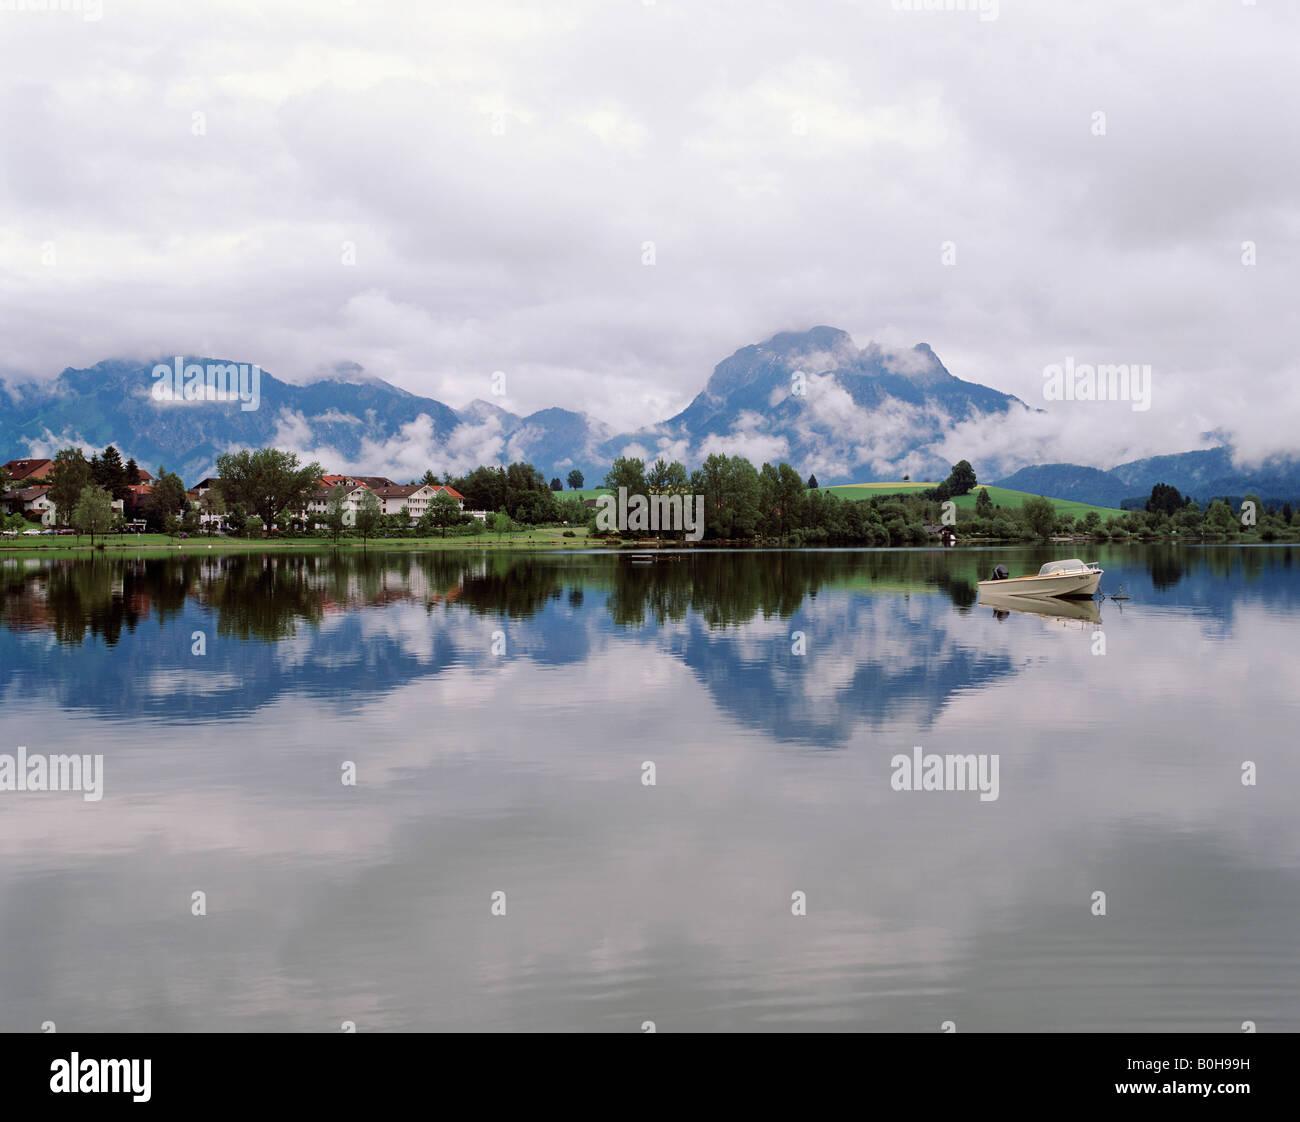 Lake Weissensee, panoramic view of the Alps, Allgaeu, Bavaria, Germany - Stock Image